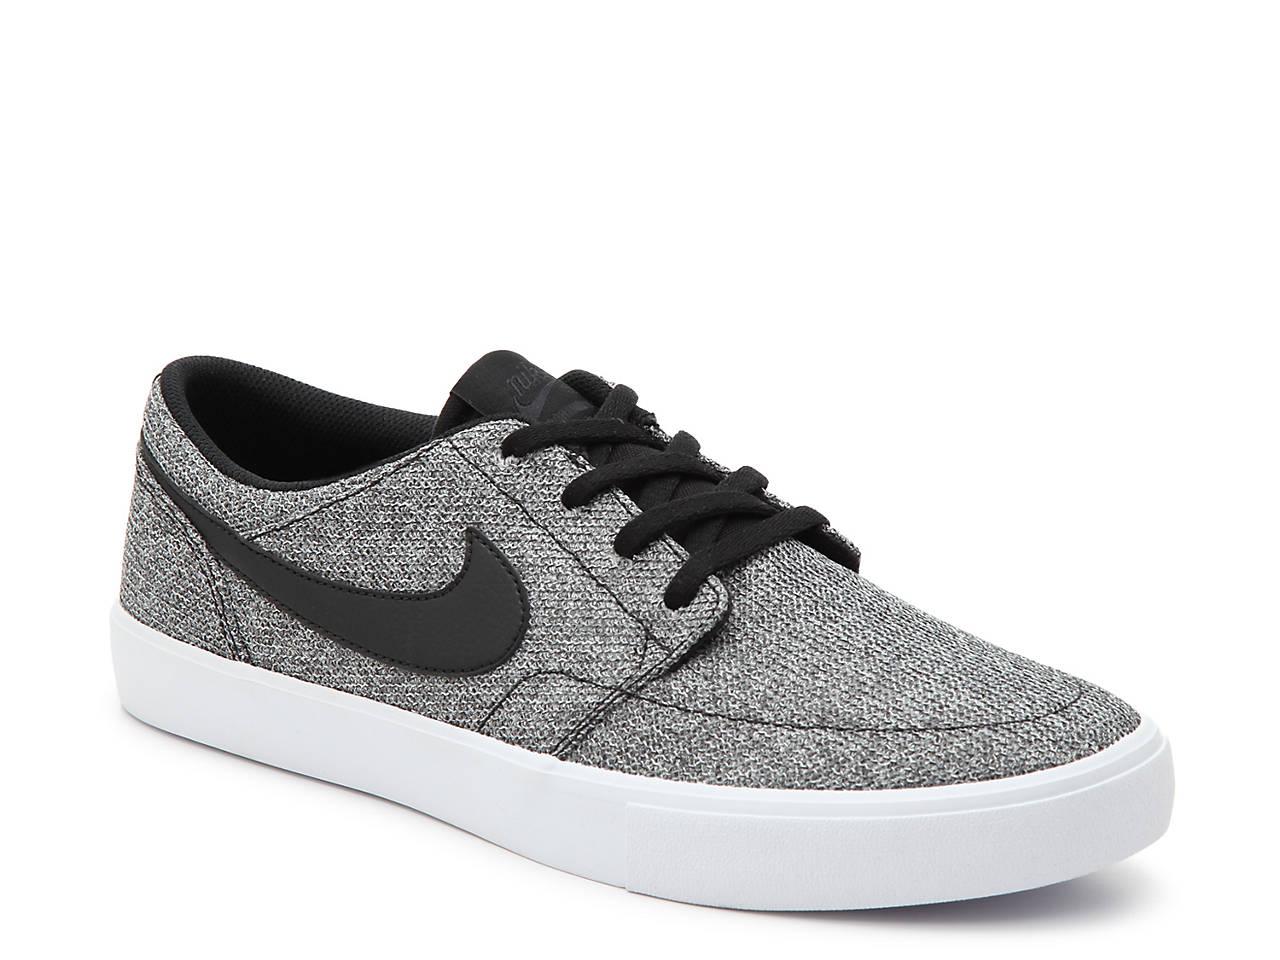 abe5eefc543b Nike SB Portmore II Canvas Sneaker - Men s Men s Shoes